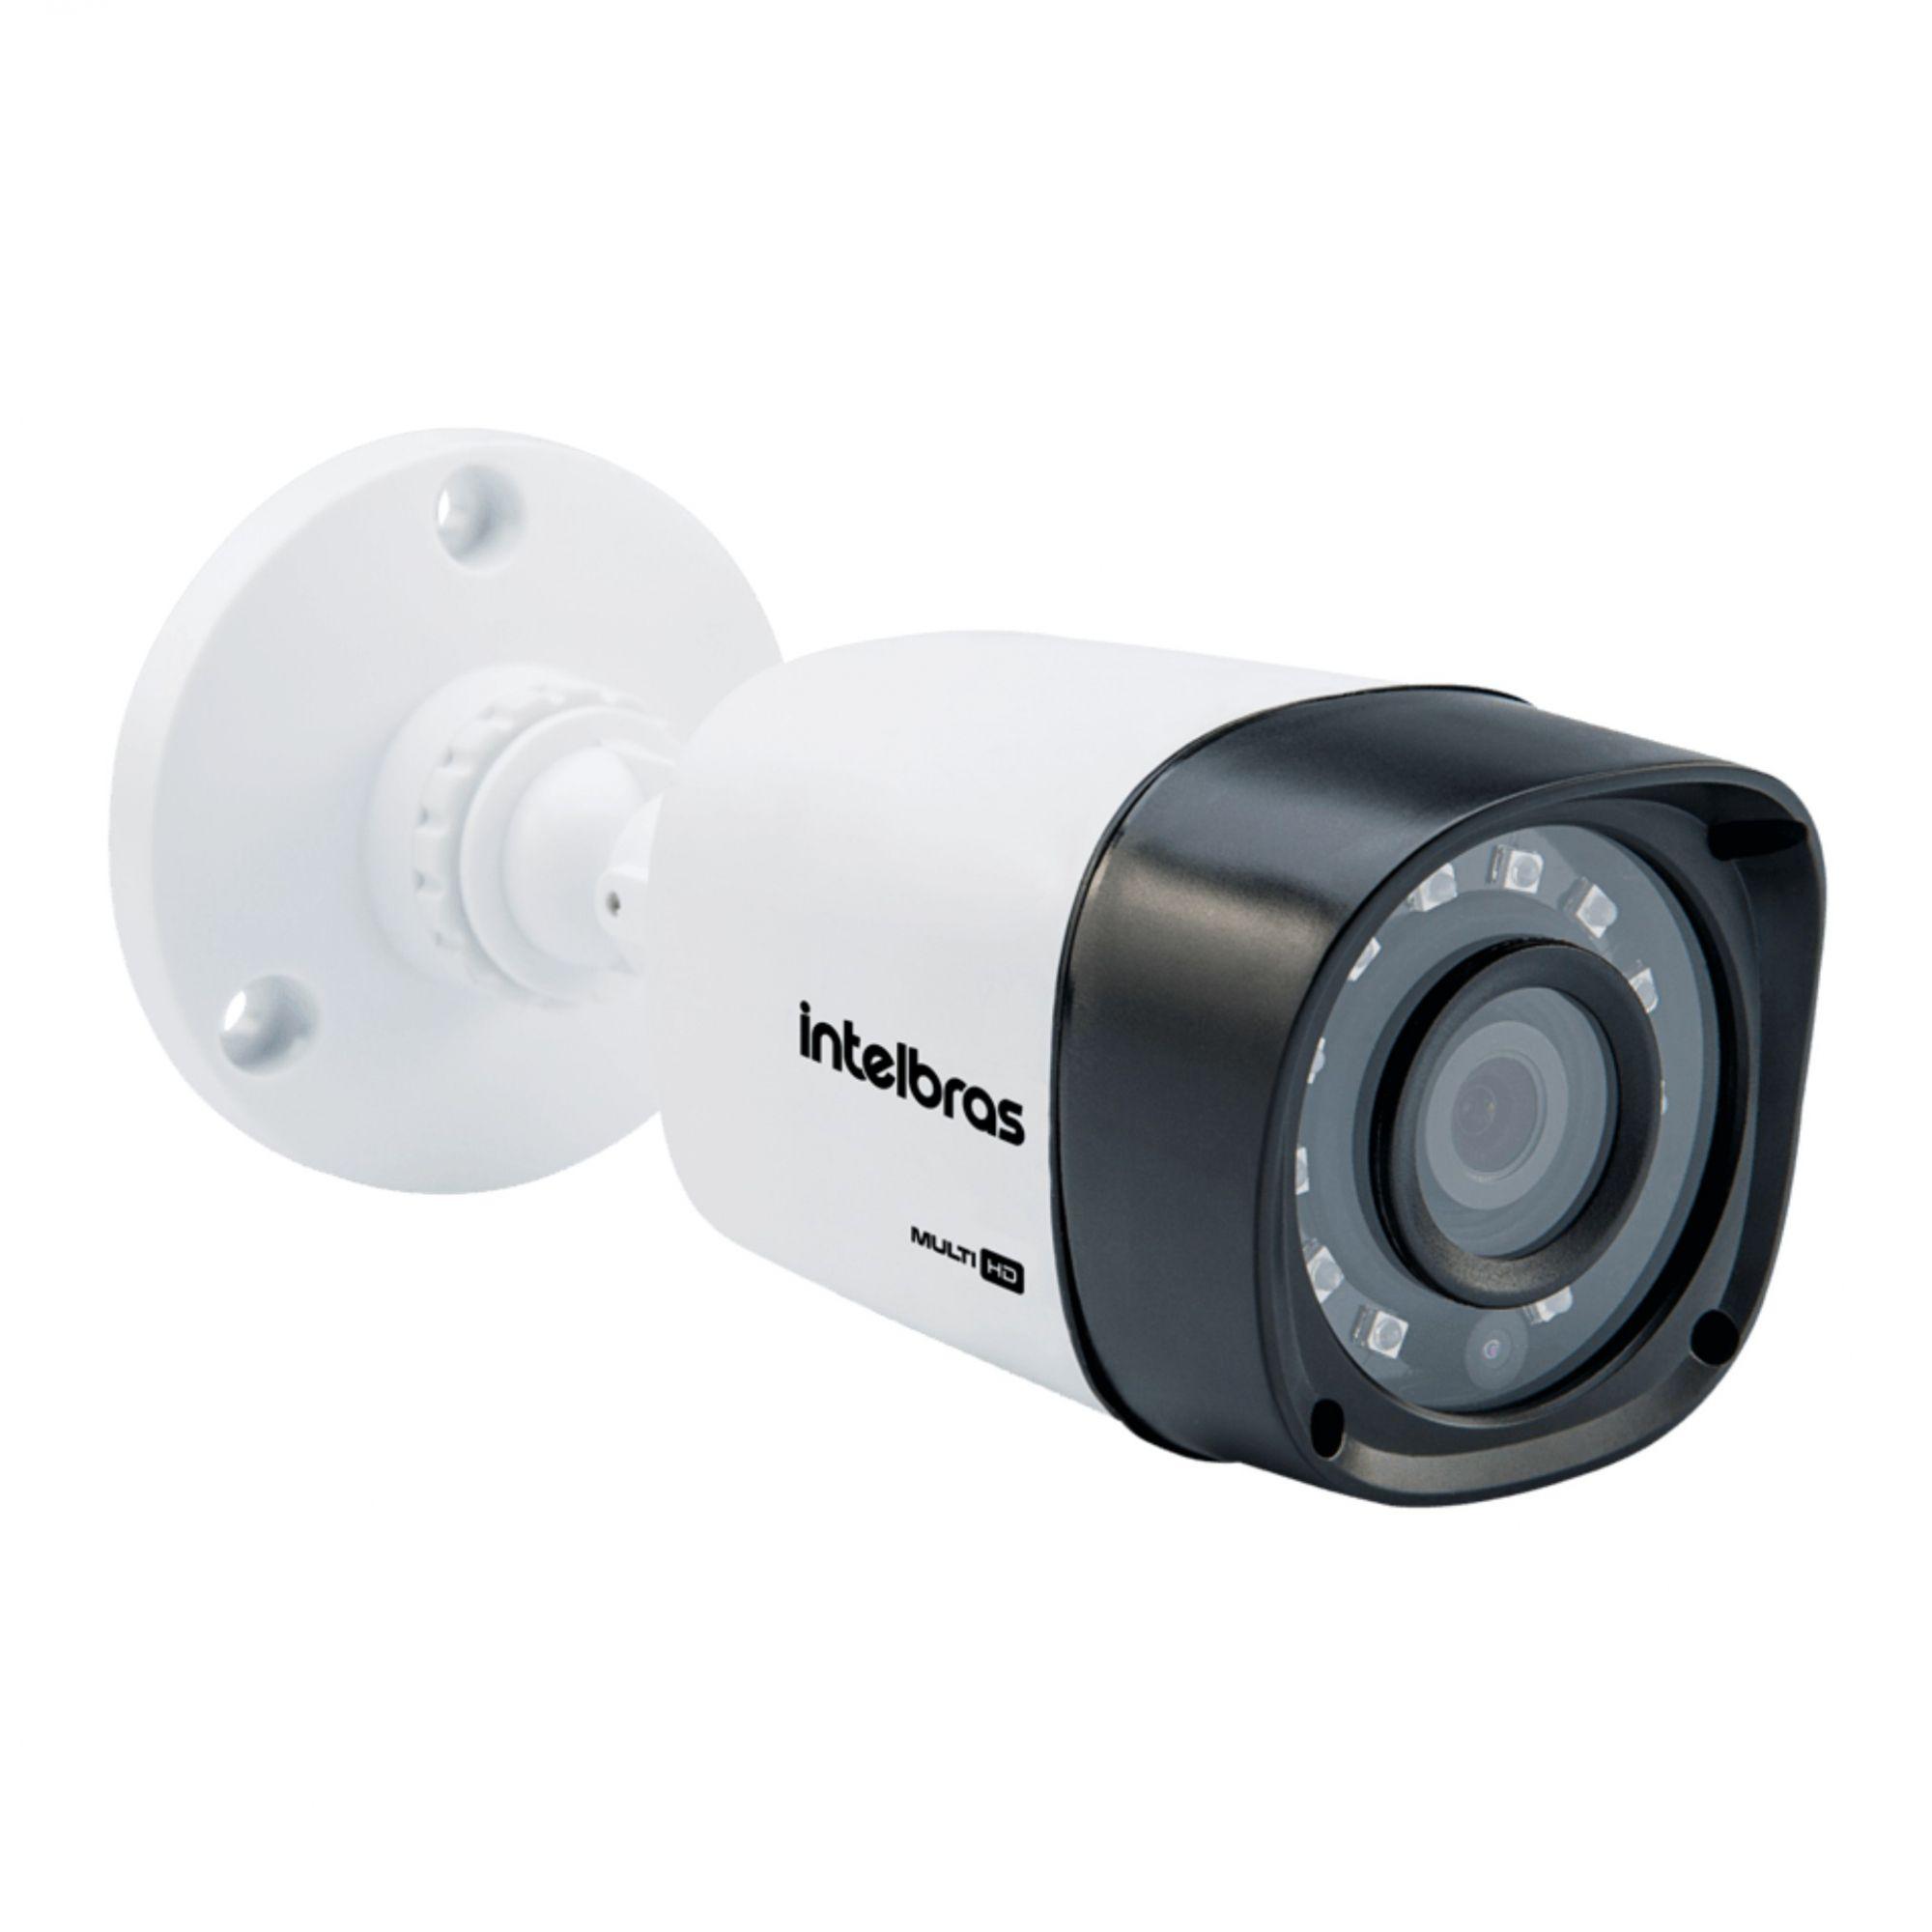 Kit CFTV Intelbras Completo 10 Câmeras AHD 720p DVR 16 Canais